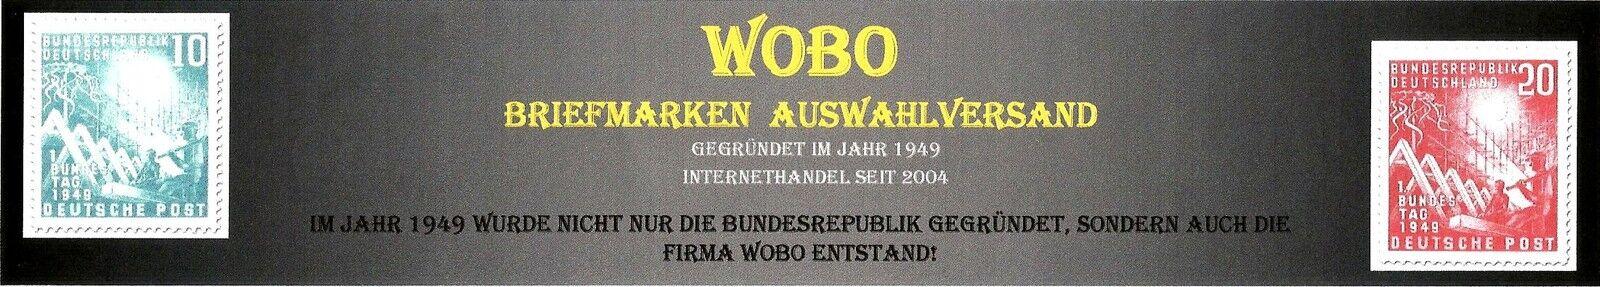 Wobo seit 1949 Partner der Sammler!